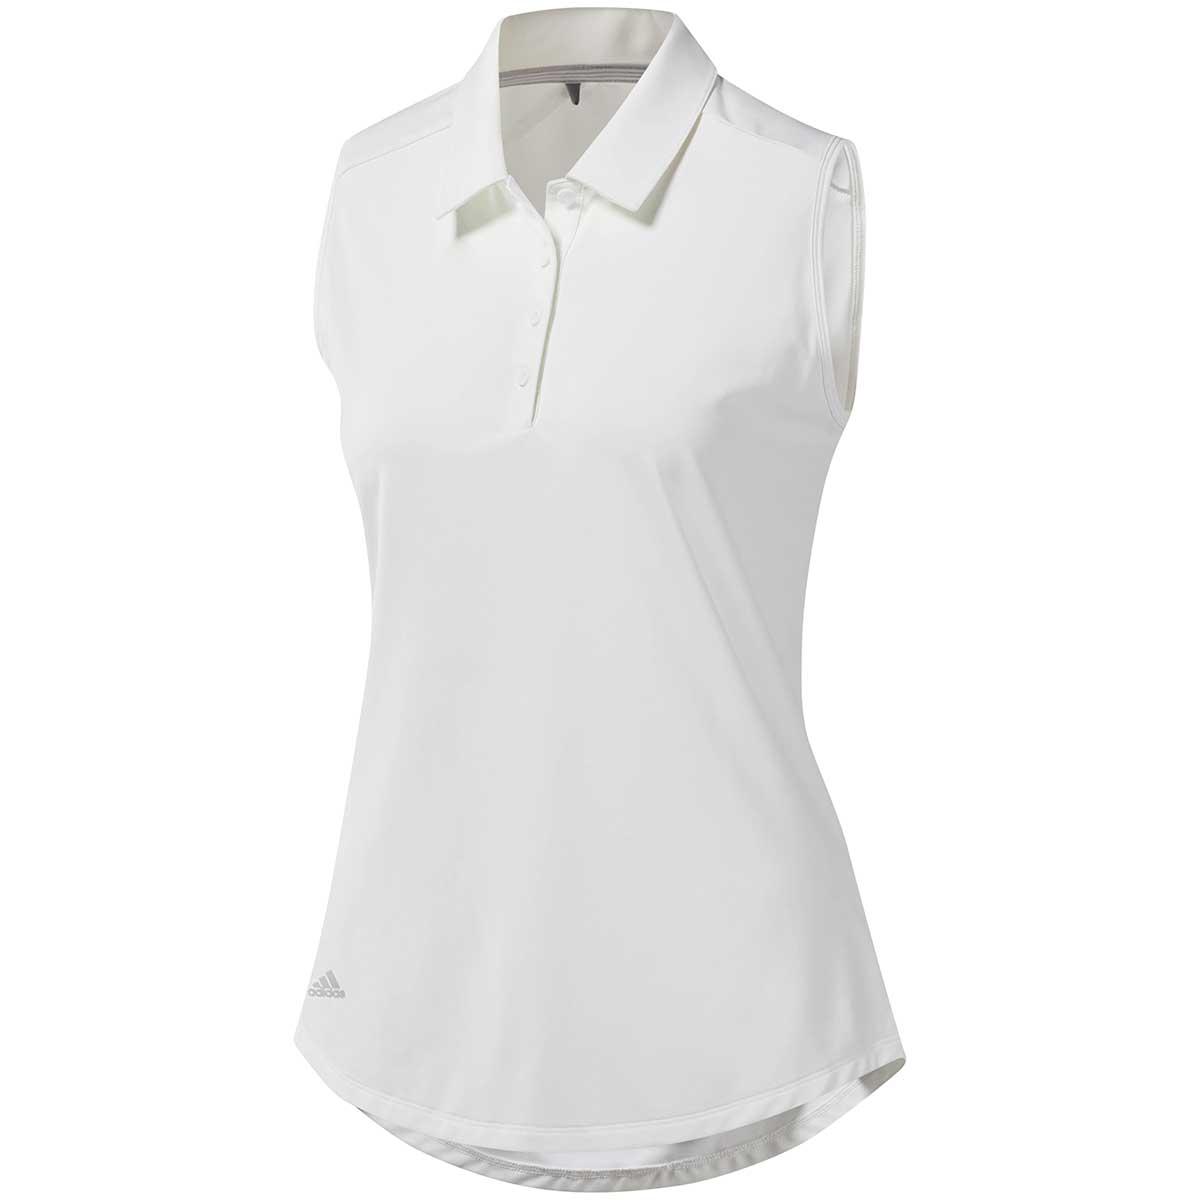 Adidas Women's Ultimate365 Sleeveless Polo Shirt - White